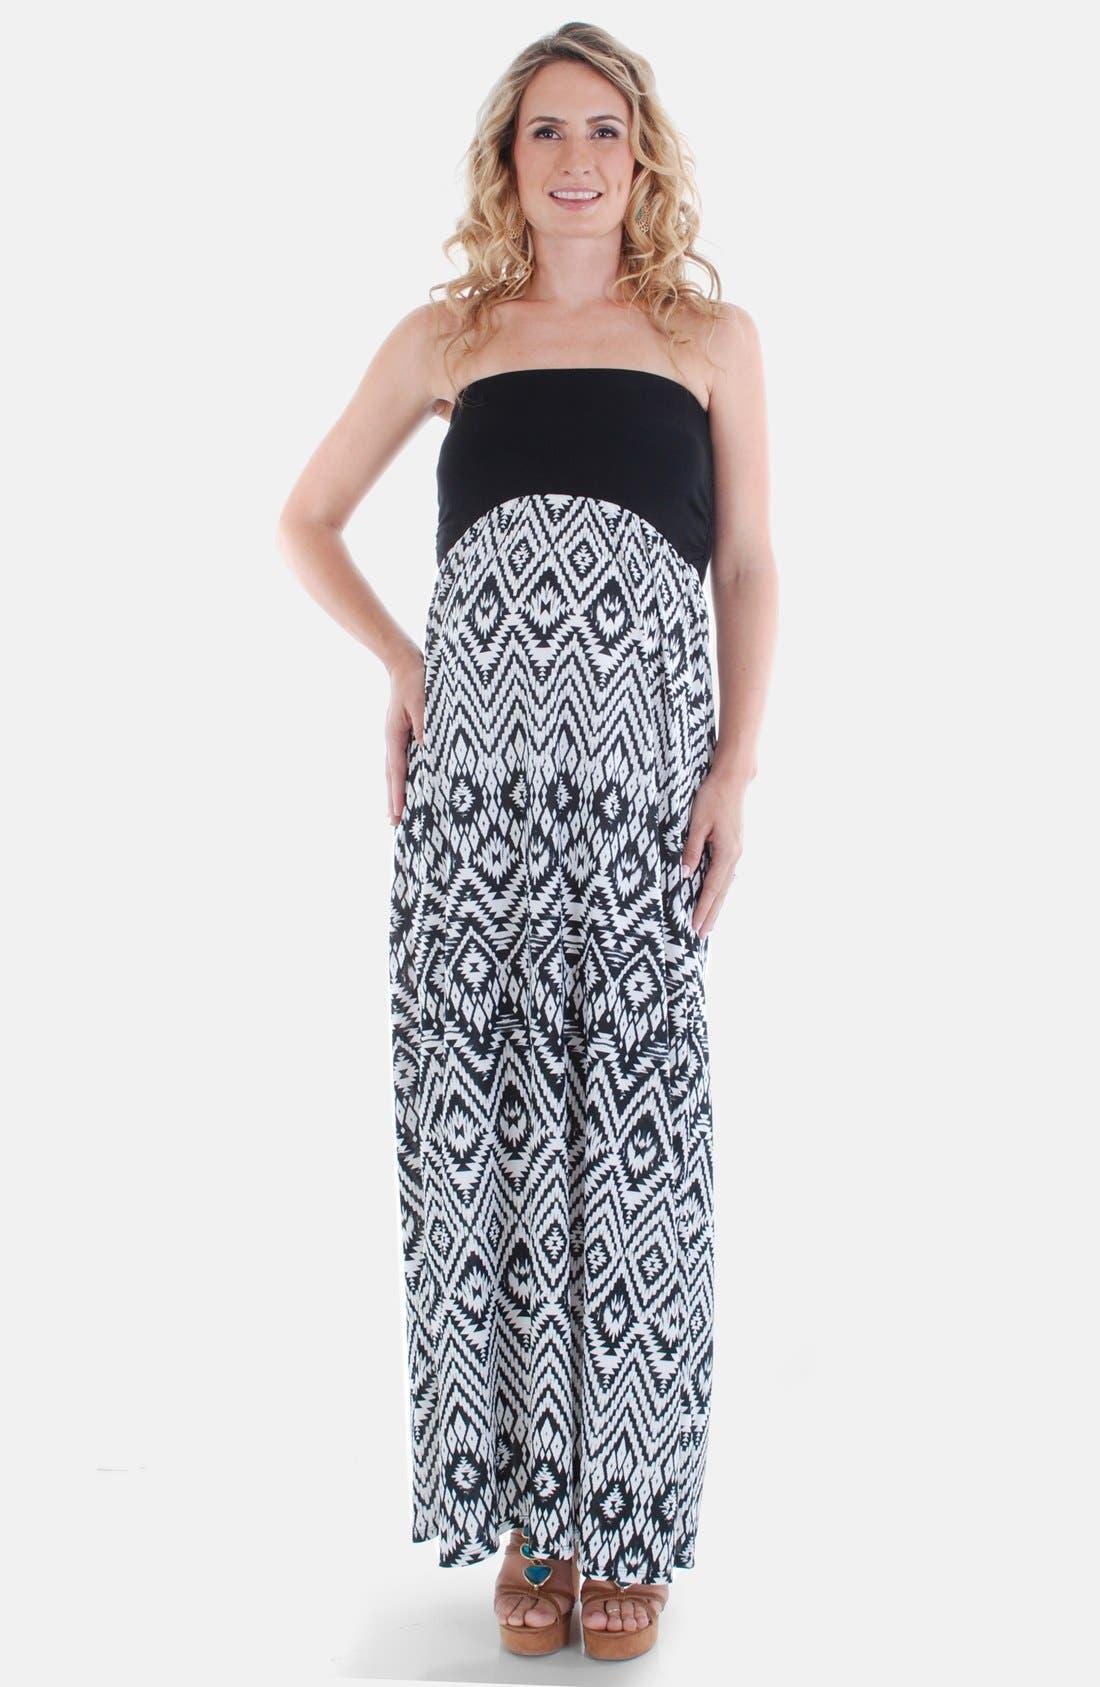 Alternate Image 1 Selected - Everly Grey 'Grace' Strapless Maternity Dress